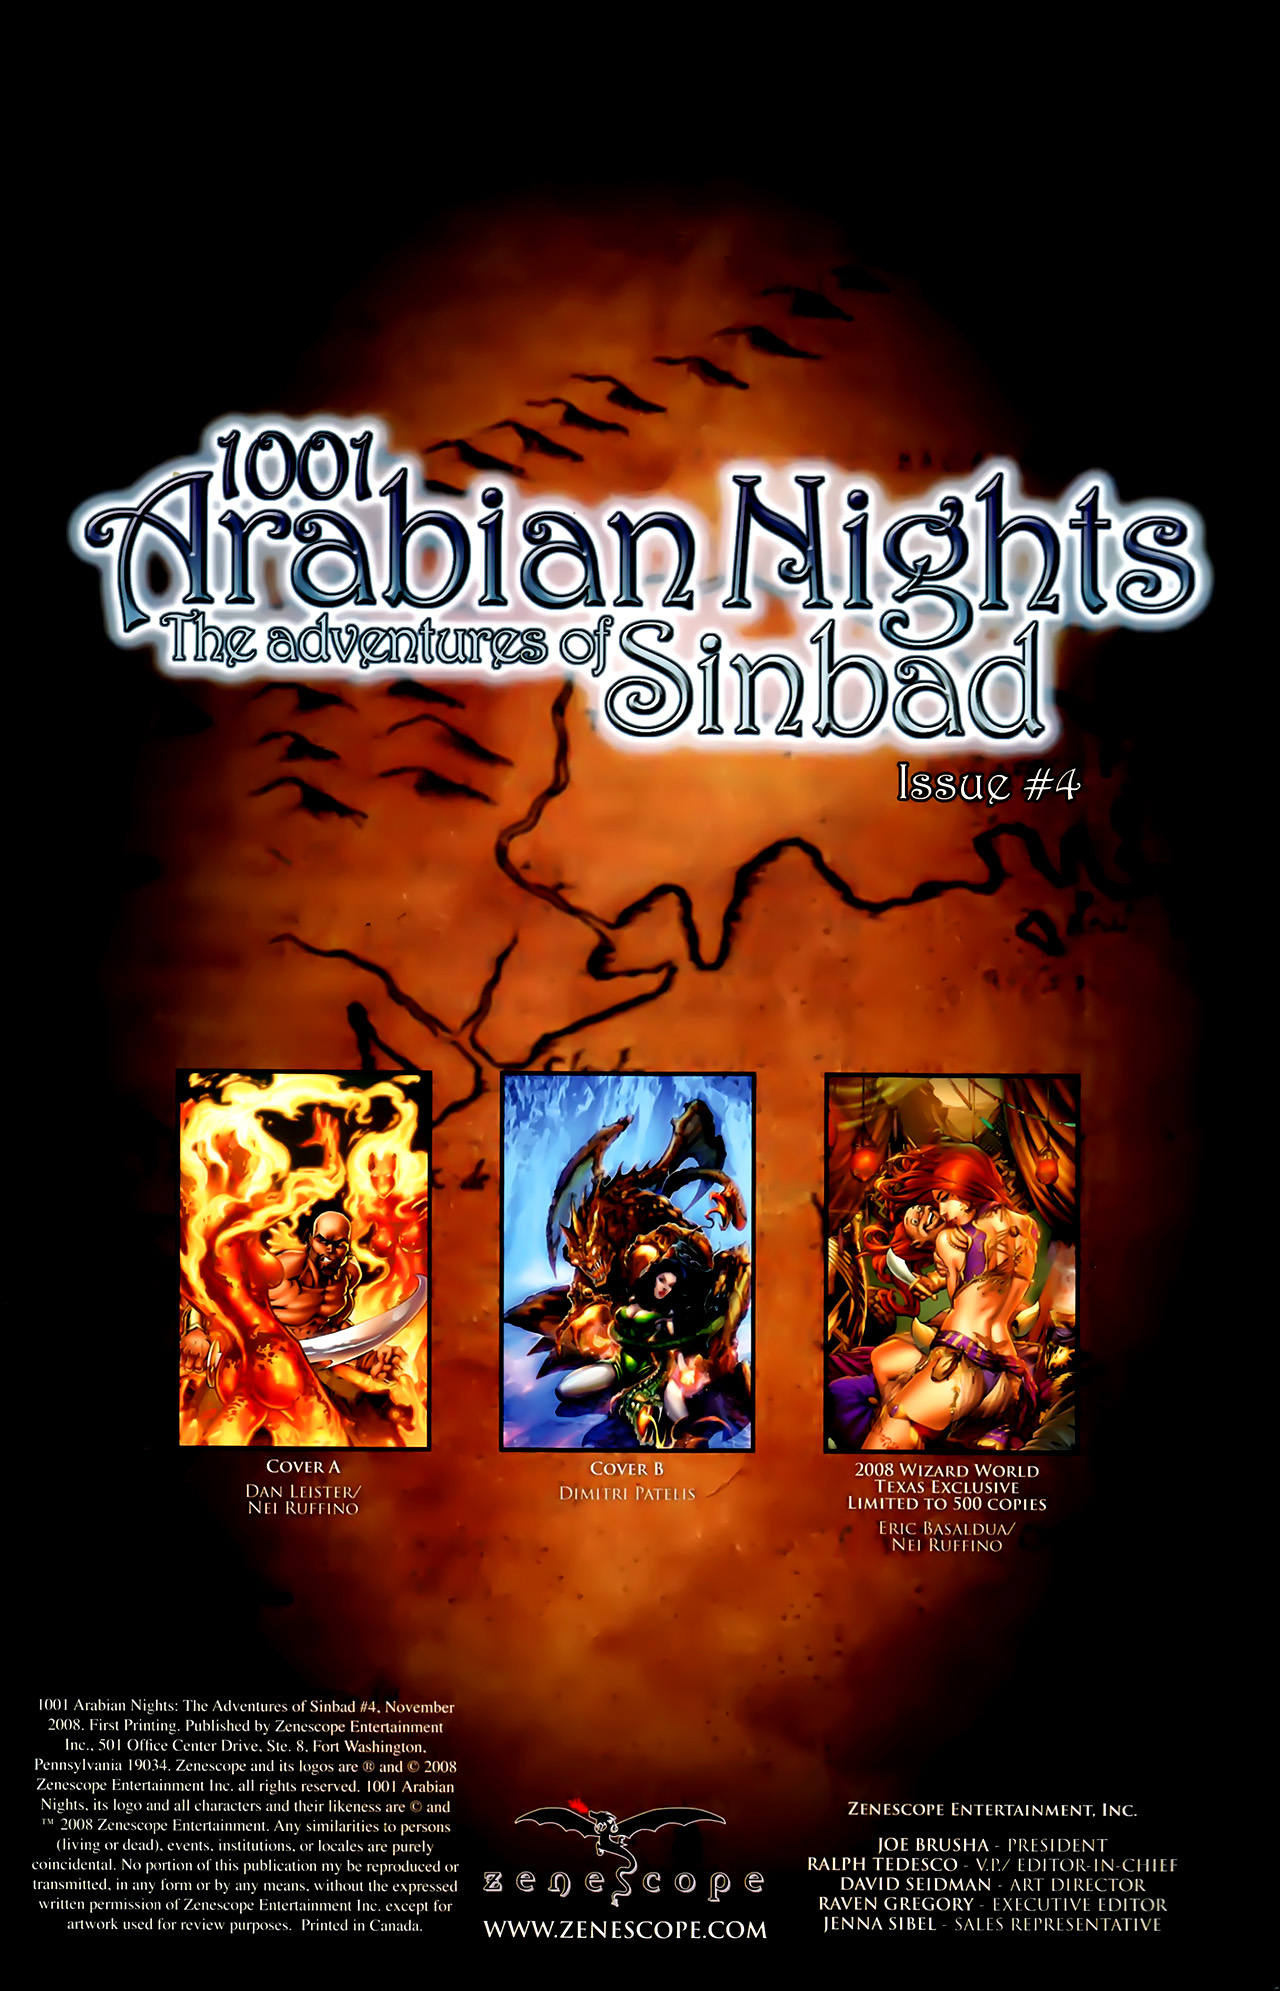 Read online 1001 Arabian Nights: The Adventures of Sinbad comic -  Issue #4 - 4